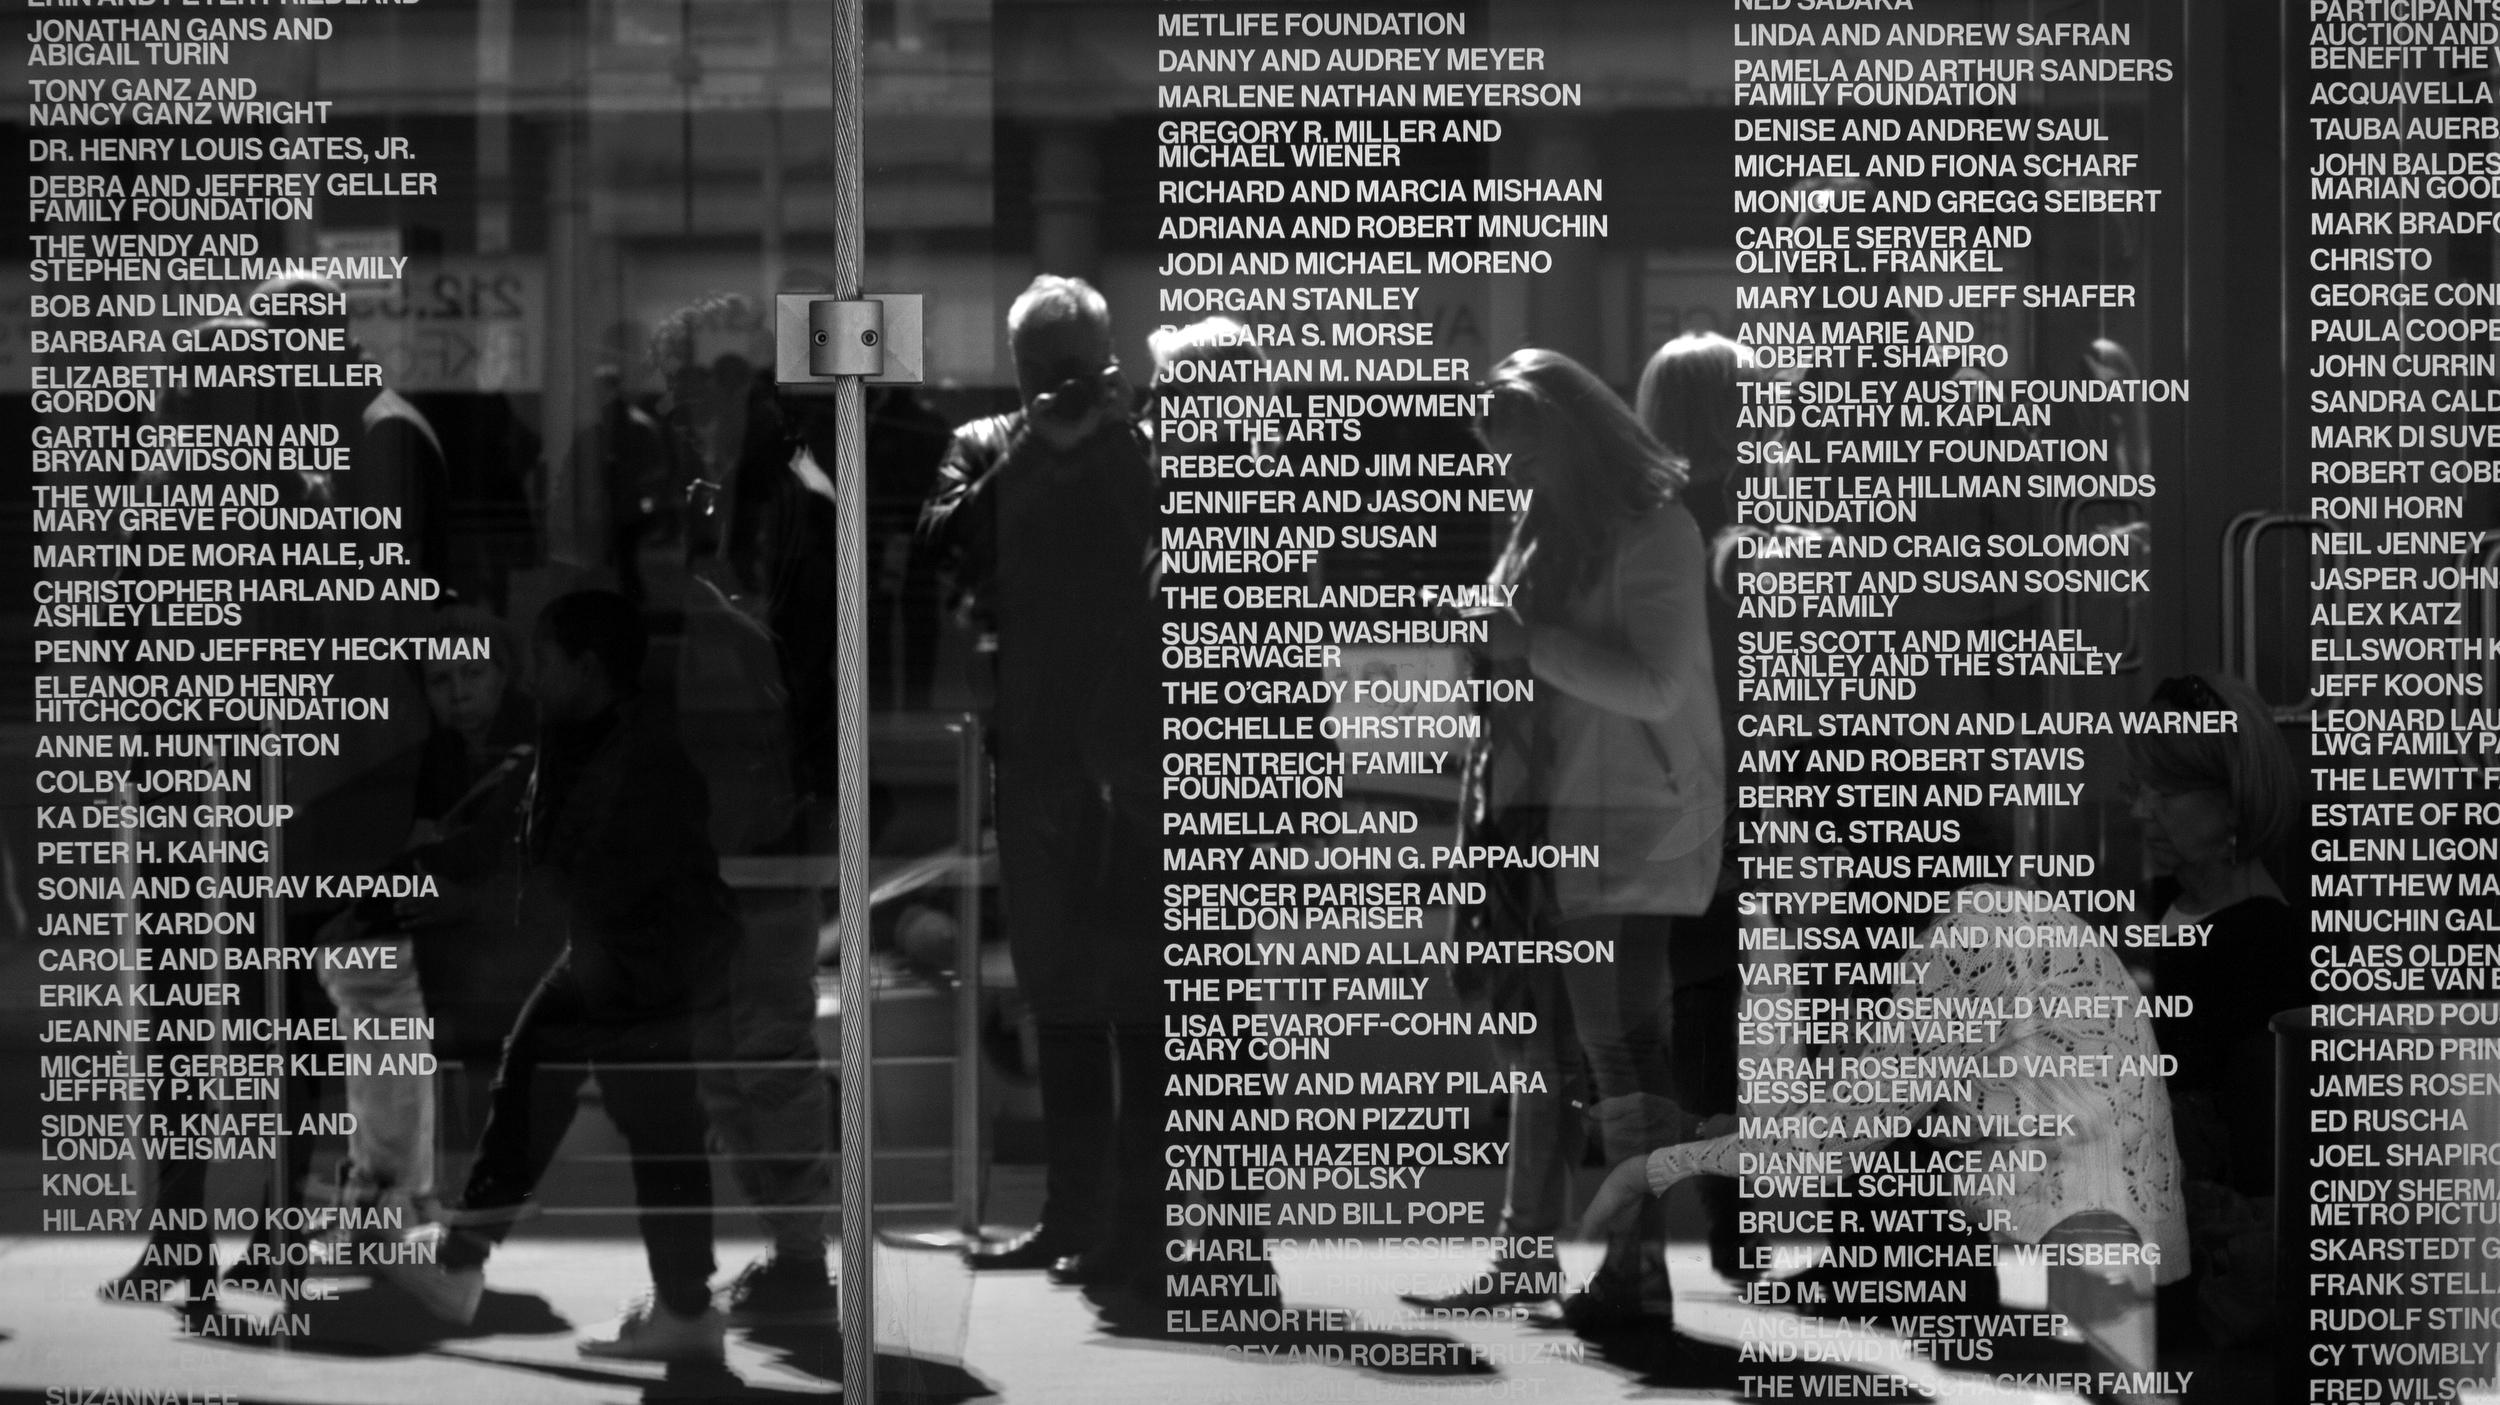 Patron wall, Whitney Museum of American Art, New York, NY